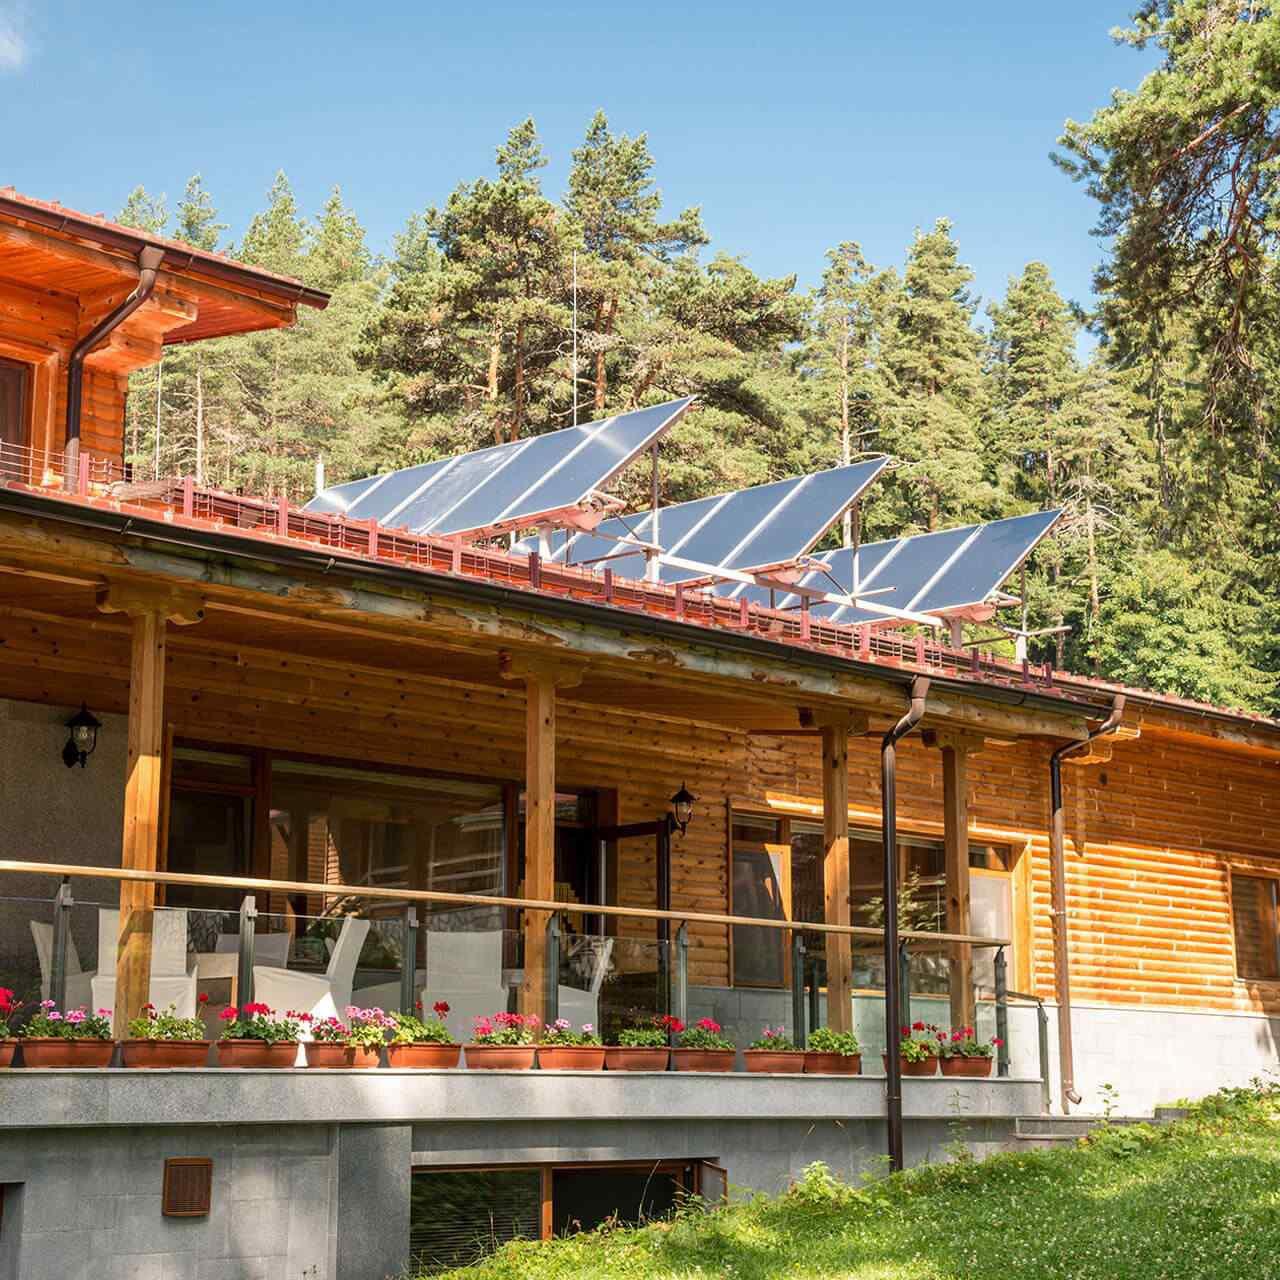 https://solarpanelstucson.biz/wp-content/uploads/2018/09/gallery_projects_11-1280x1280.jpg